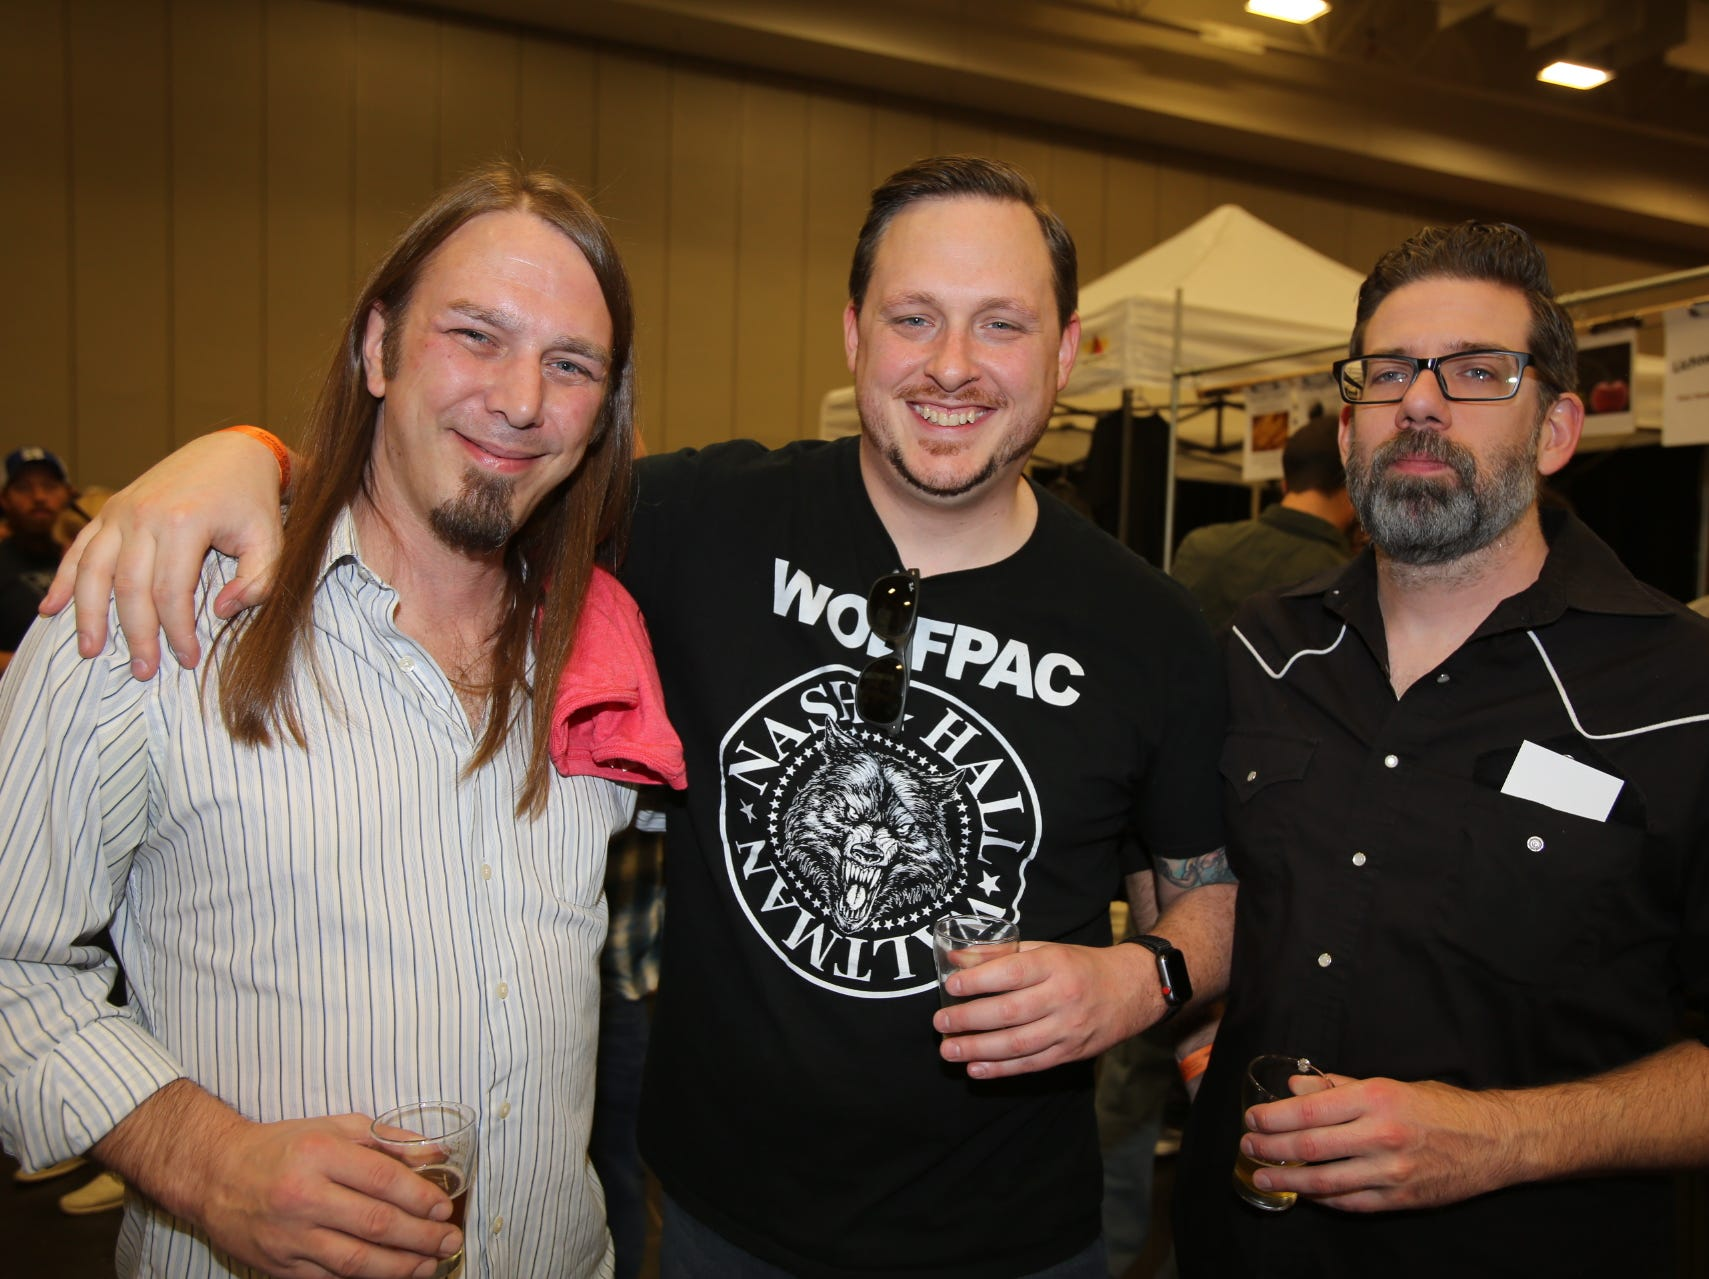 Chris Kampa, Seth Fulton, and Ryan Wallace